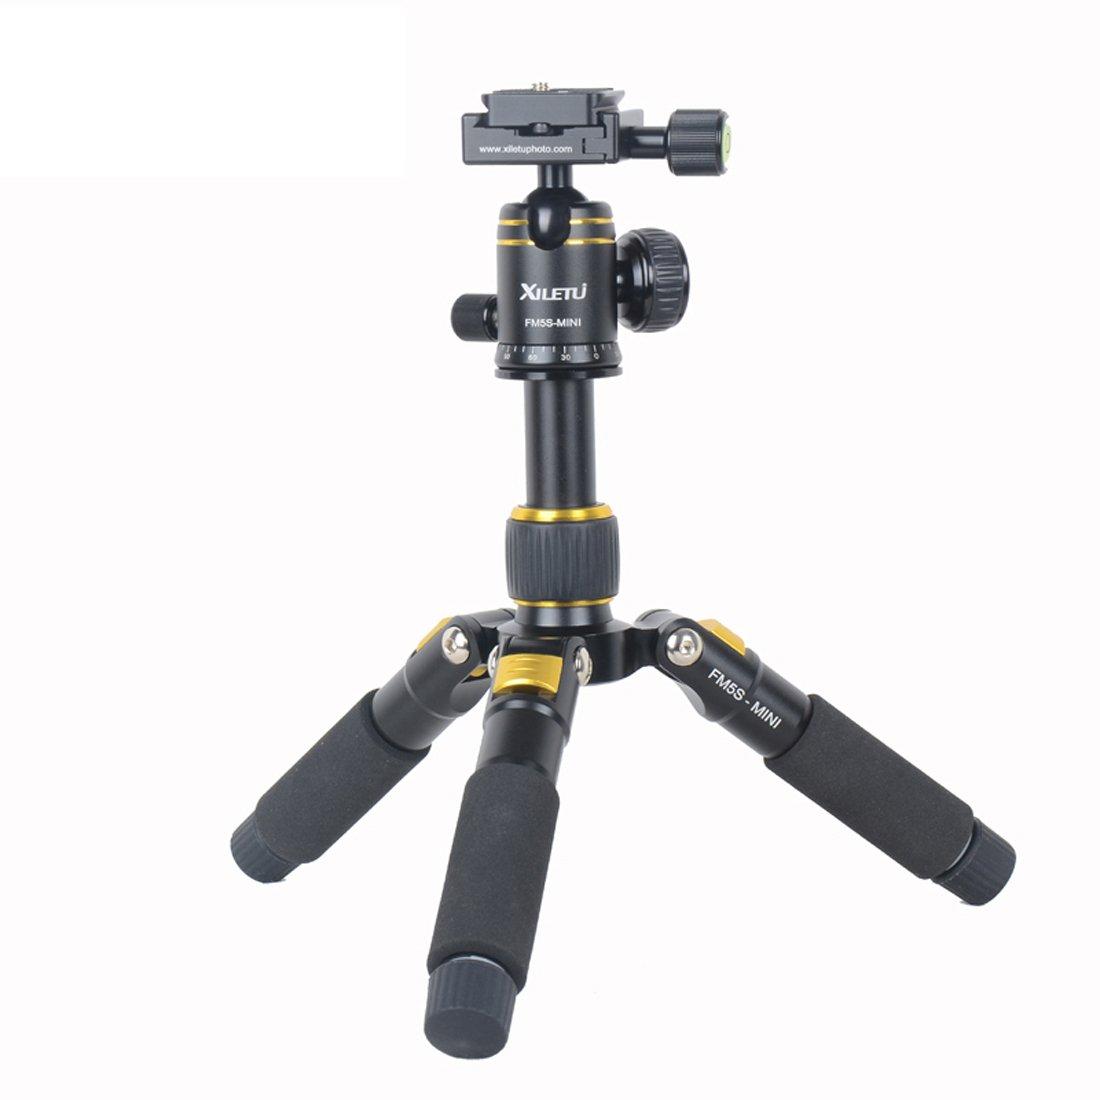 xiletu fm5s-miniテーブルトップ三脚とボールヘッドキットfor DSLRミラーレスカメラスマート電話& # xff08 ; Golden & # xff09 ;   B07236GTYS